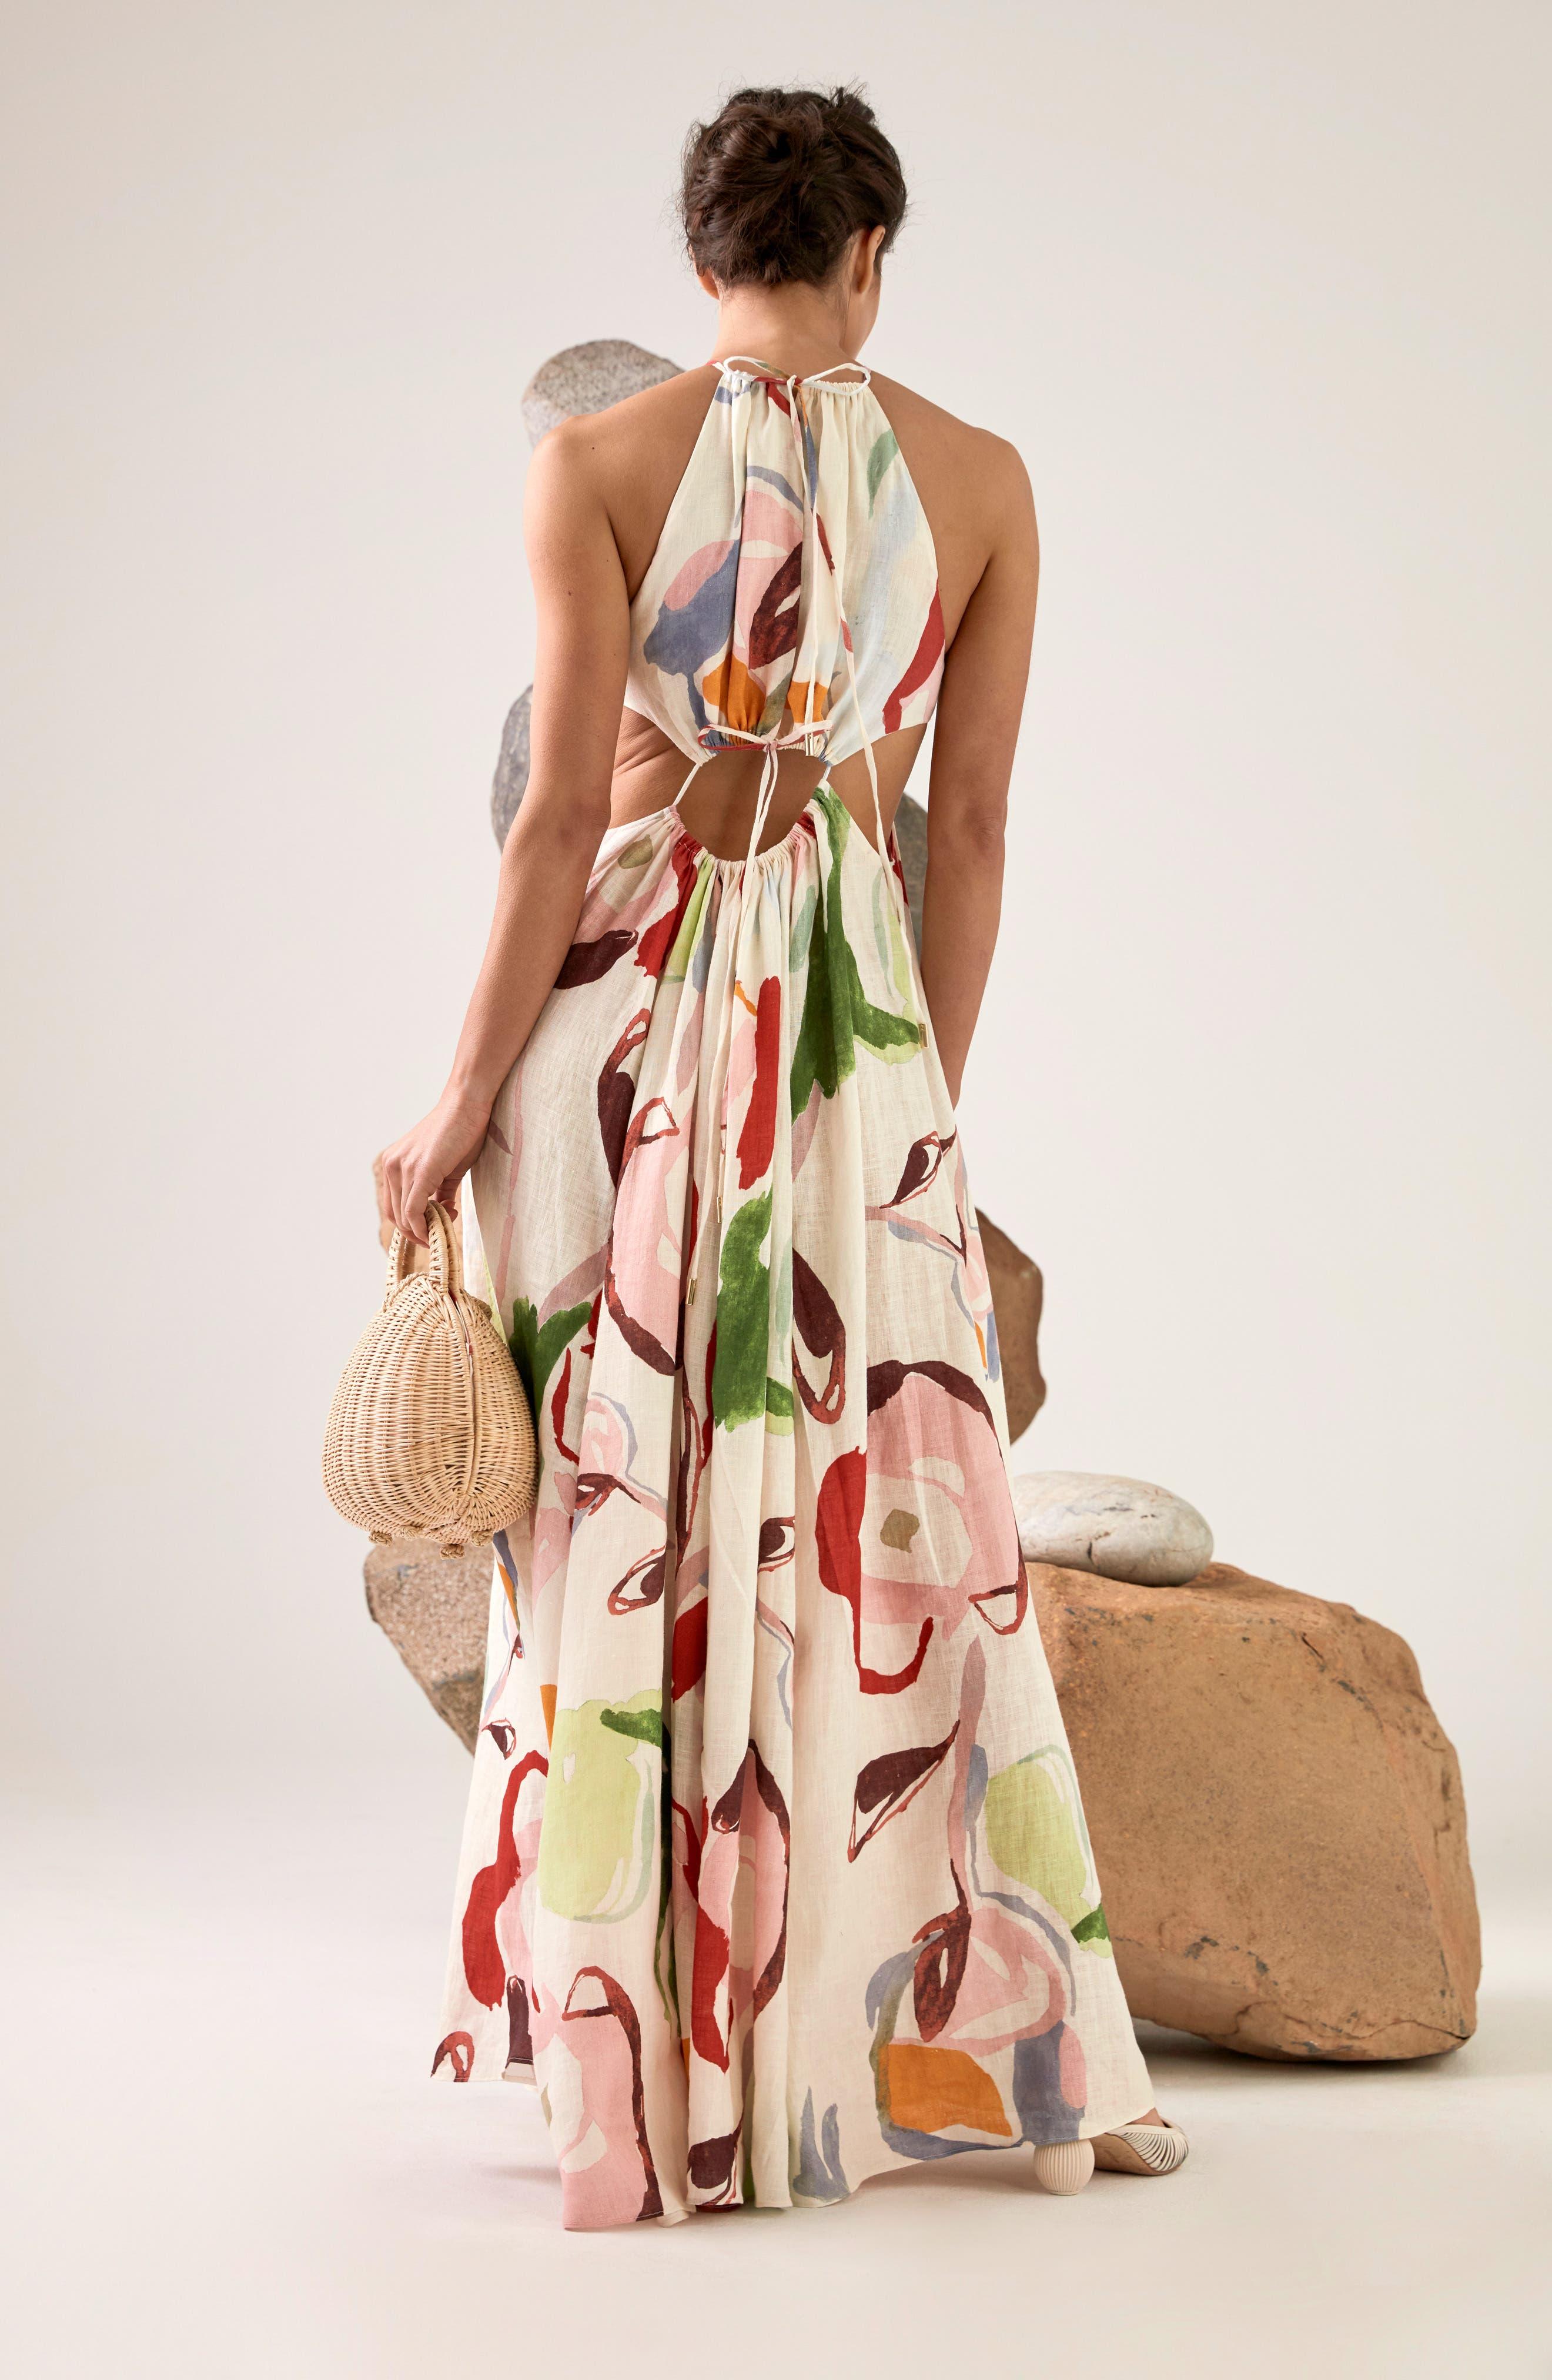 CULT GAIA, Aphrodite Grecian Halter Gown, Alternate thumbnail 2, color, 100